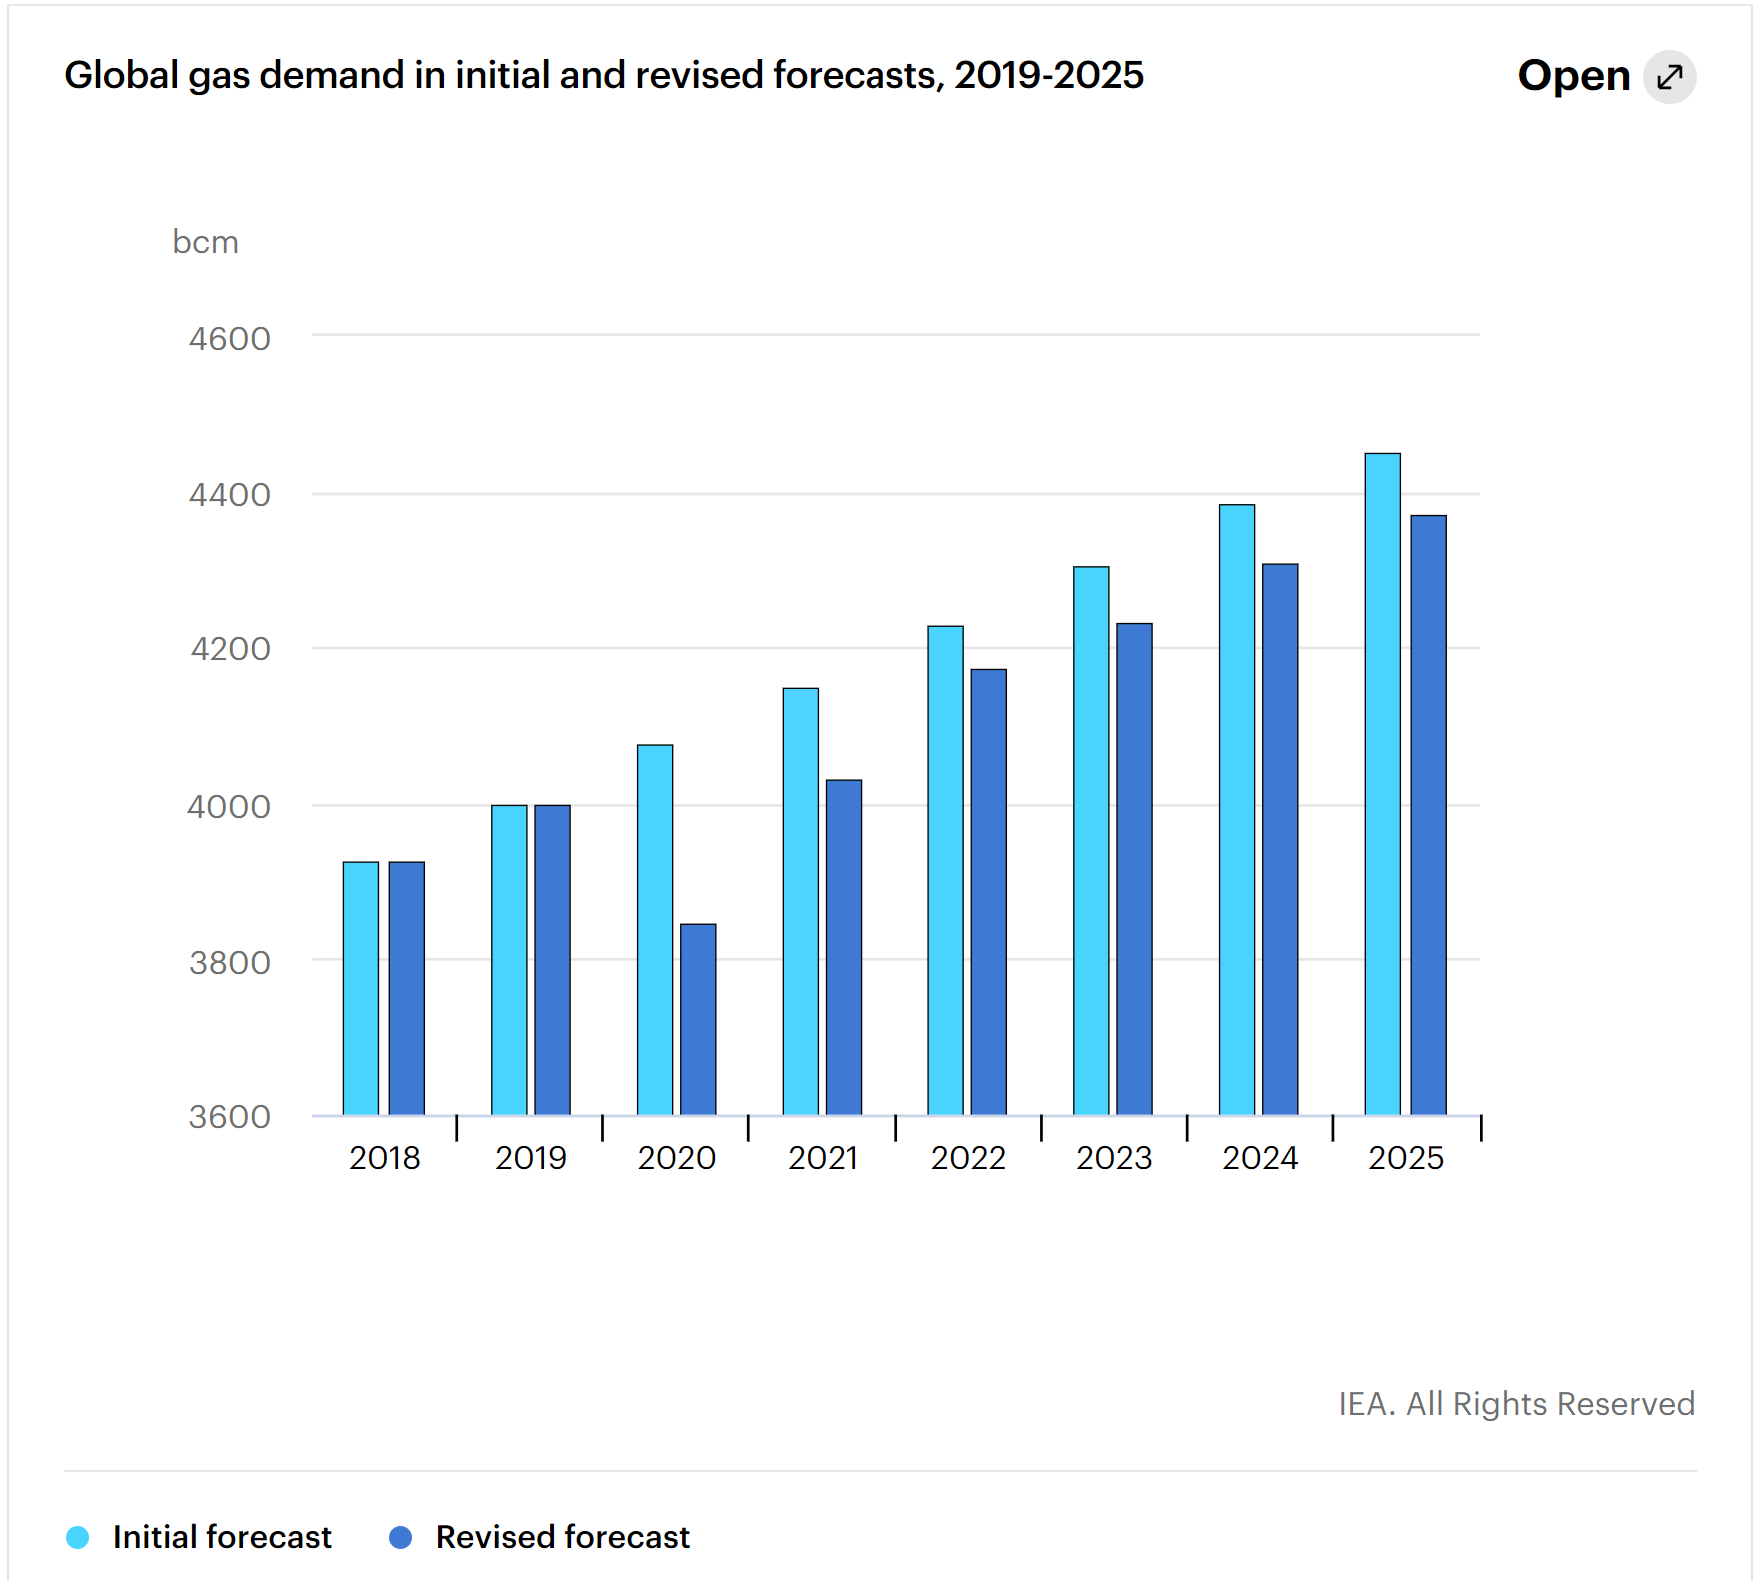 IEA gas demand estimates